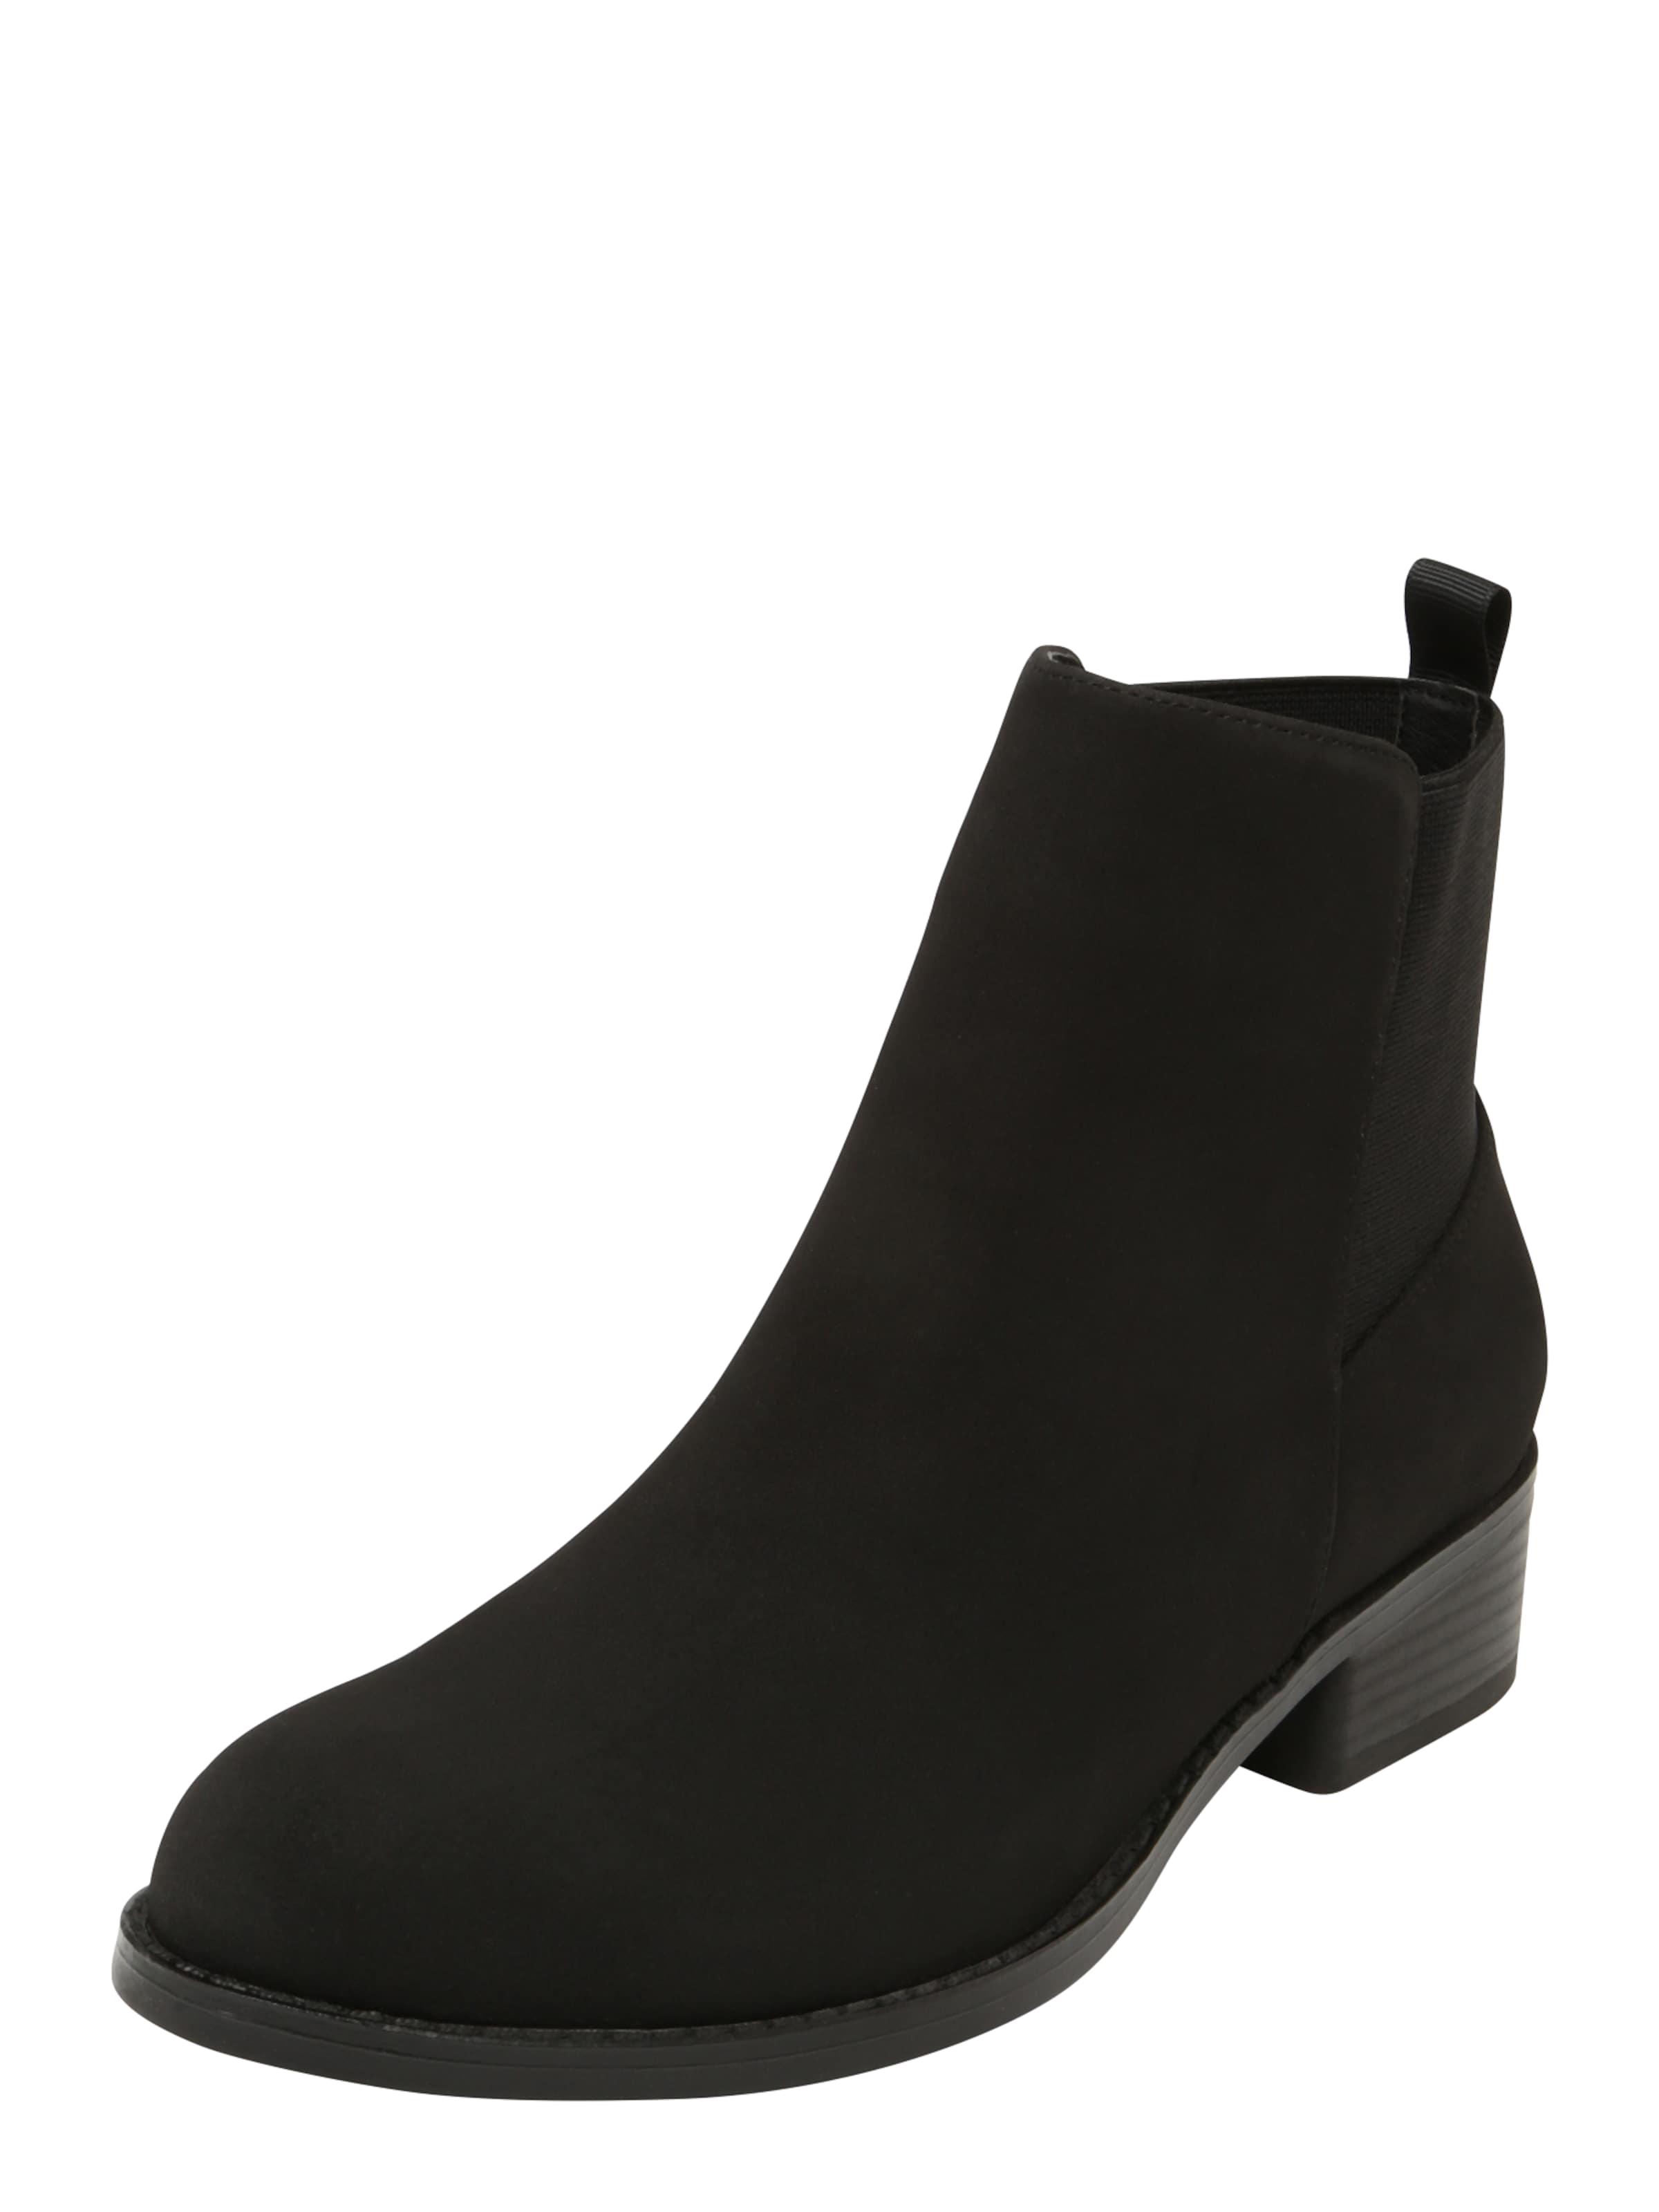 En Bianco Noir Boots Chelsea bfI76mgvyY